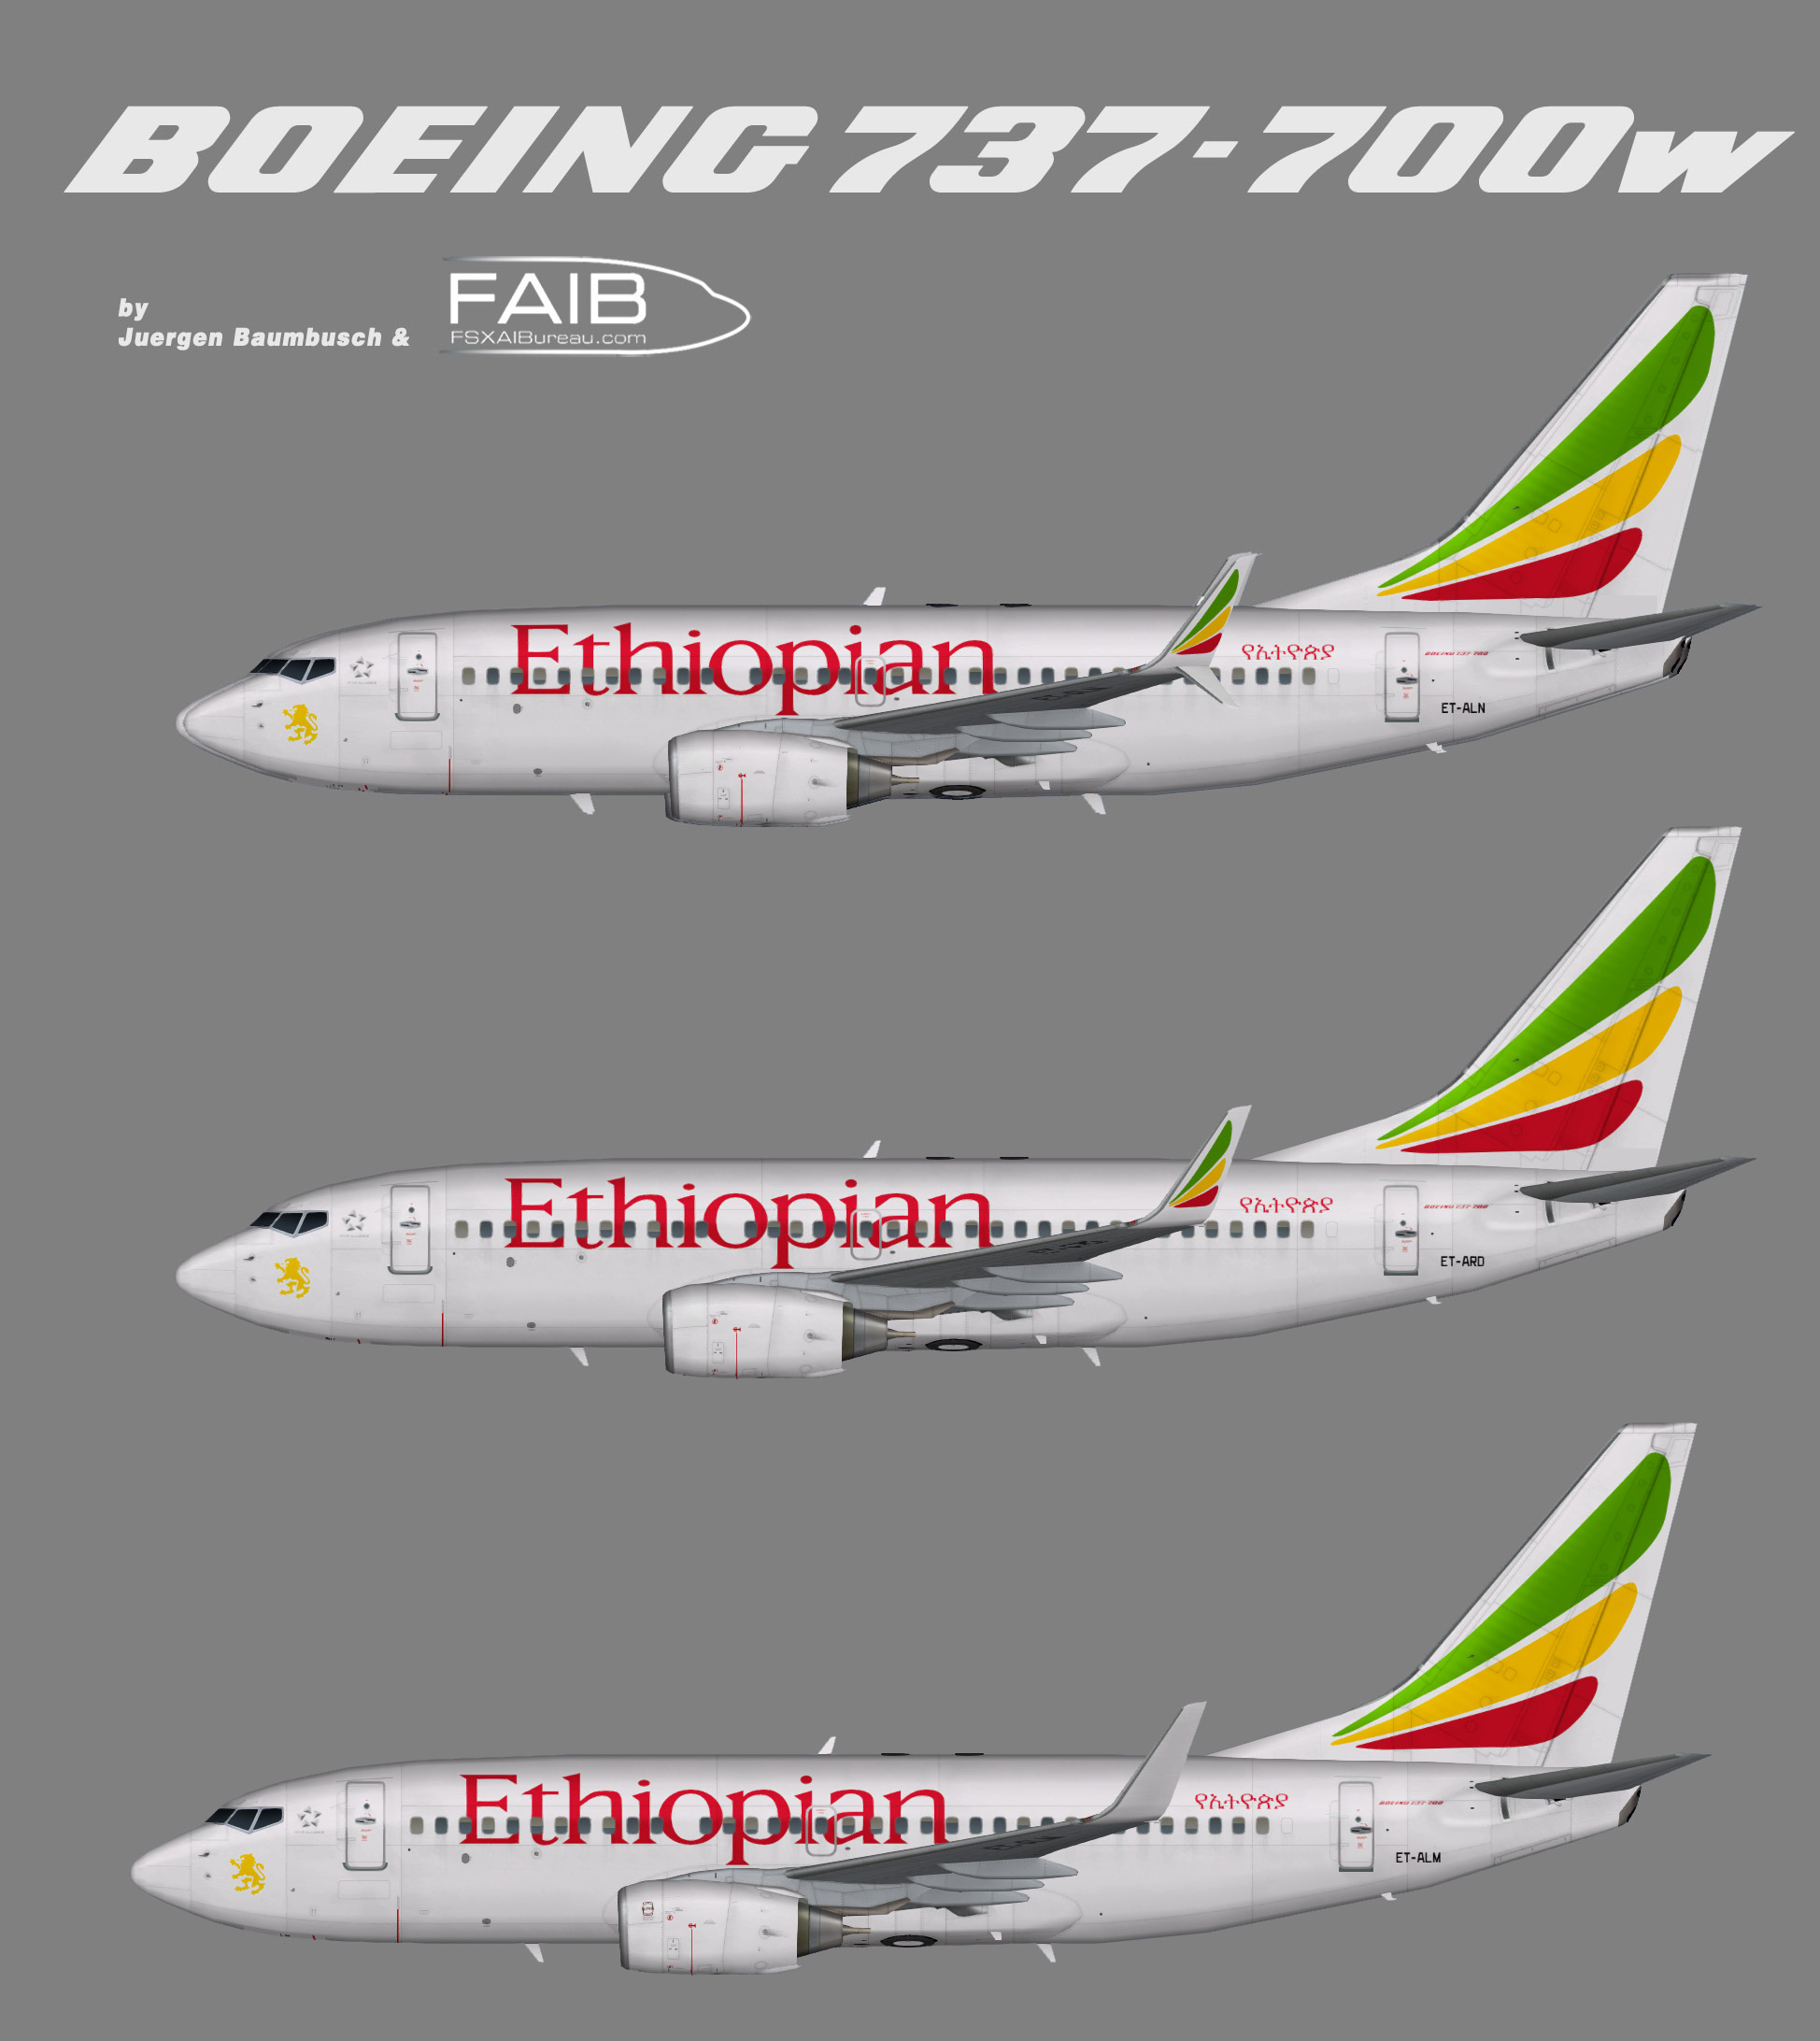 Ethiopian Airlines Boeing 737-700w